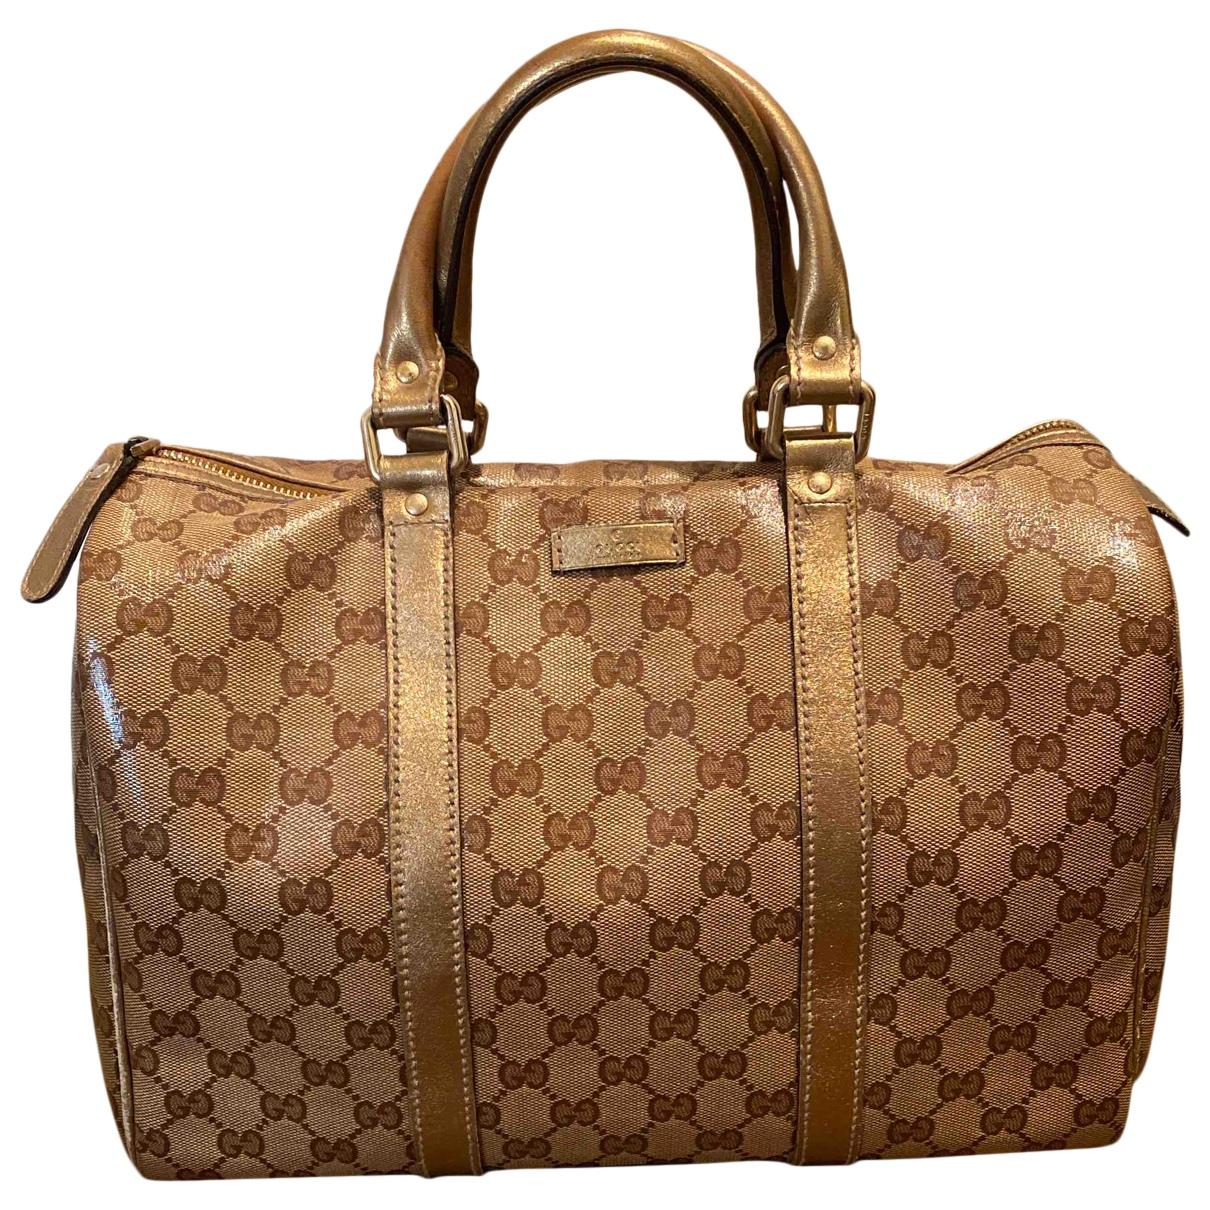 Gucci - Sac a main Ophidia pour femme en cuir - dore